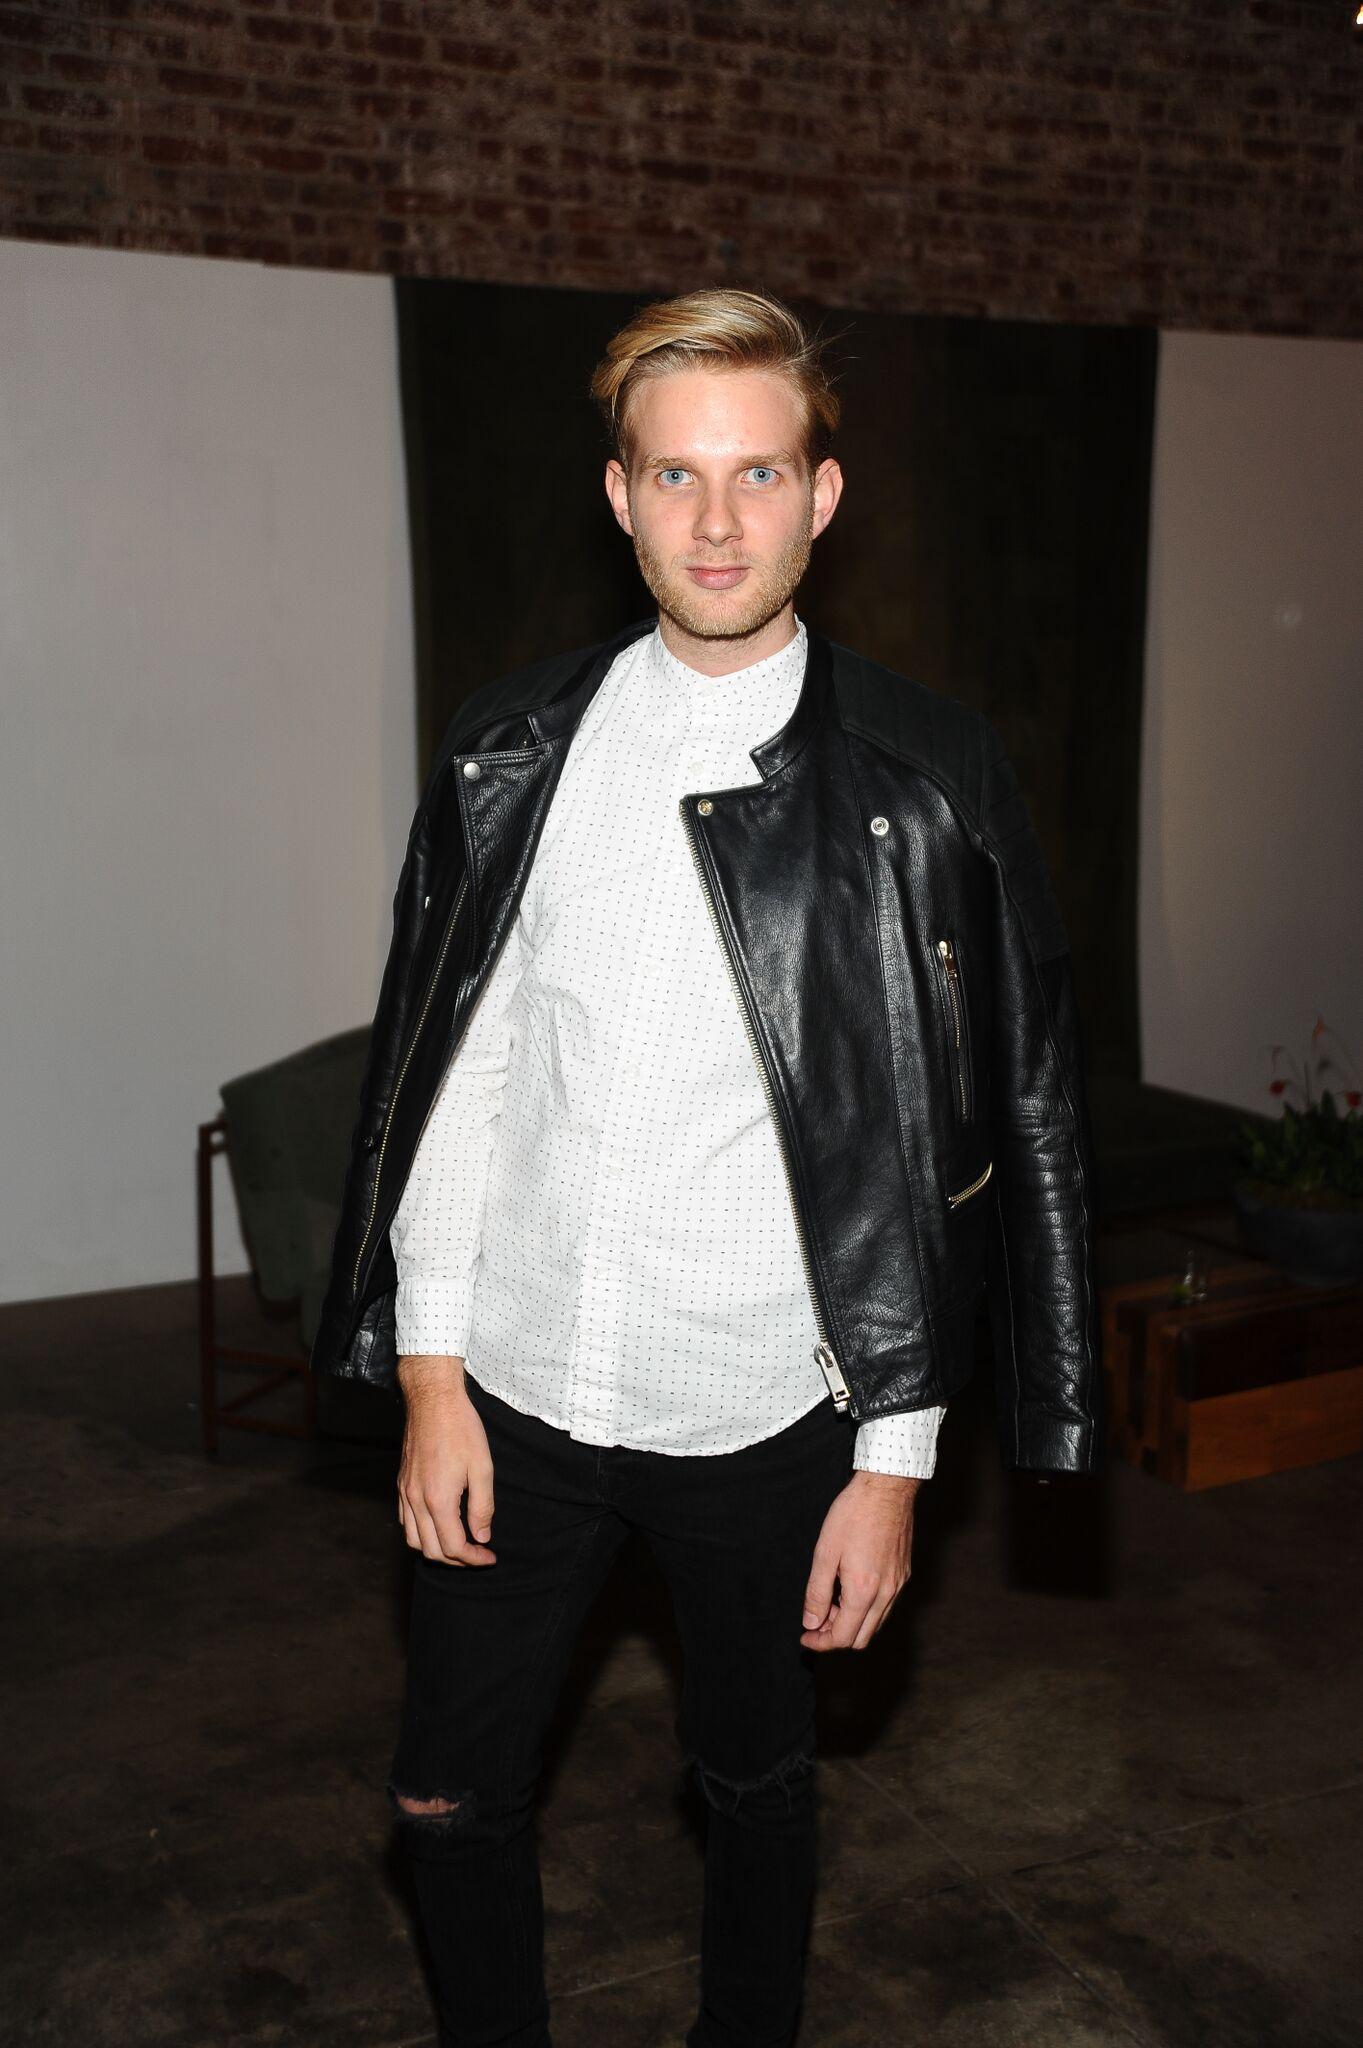 Timothy Godbold - Military Style Invades Fashion - Phaidon Press32.jpg